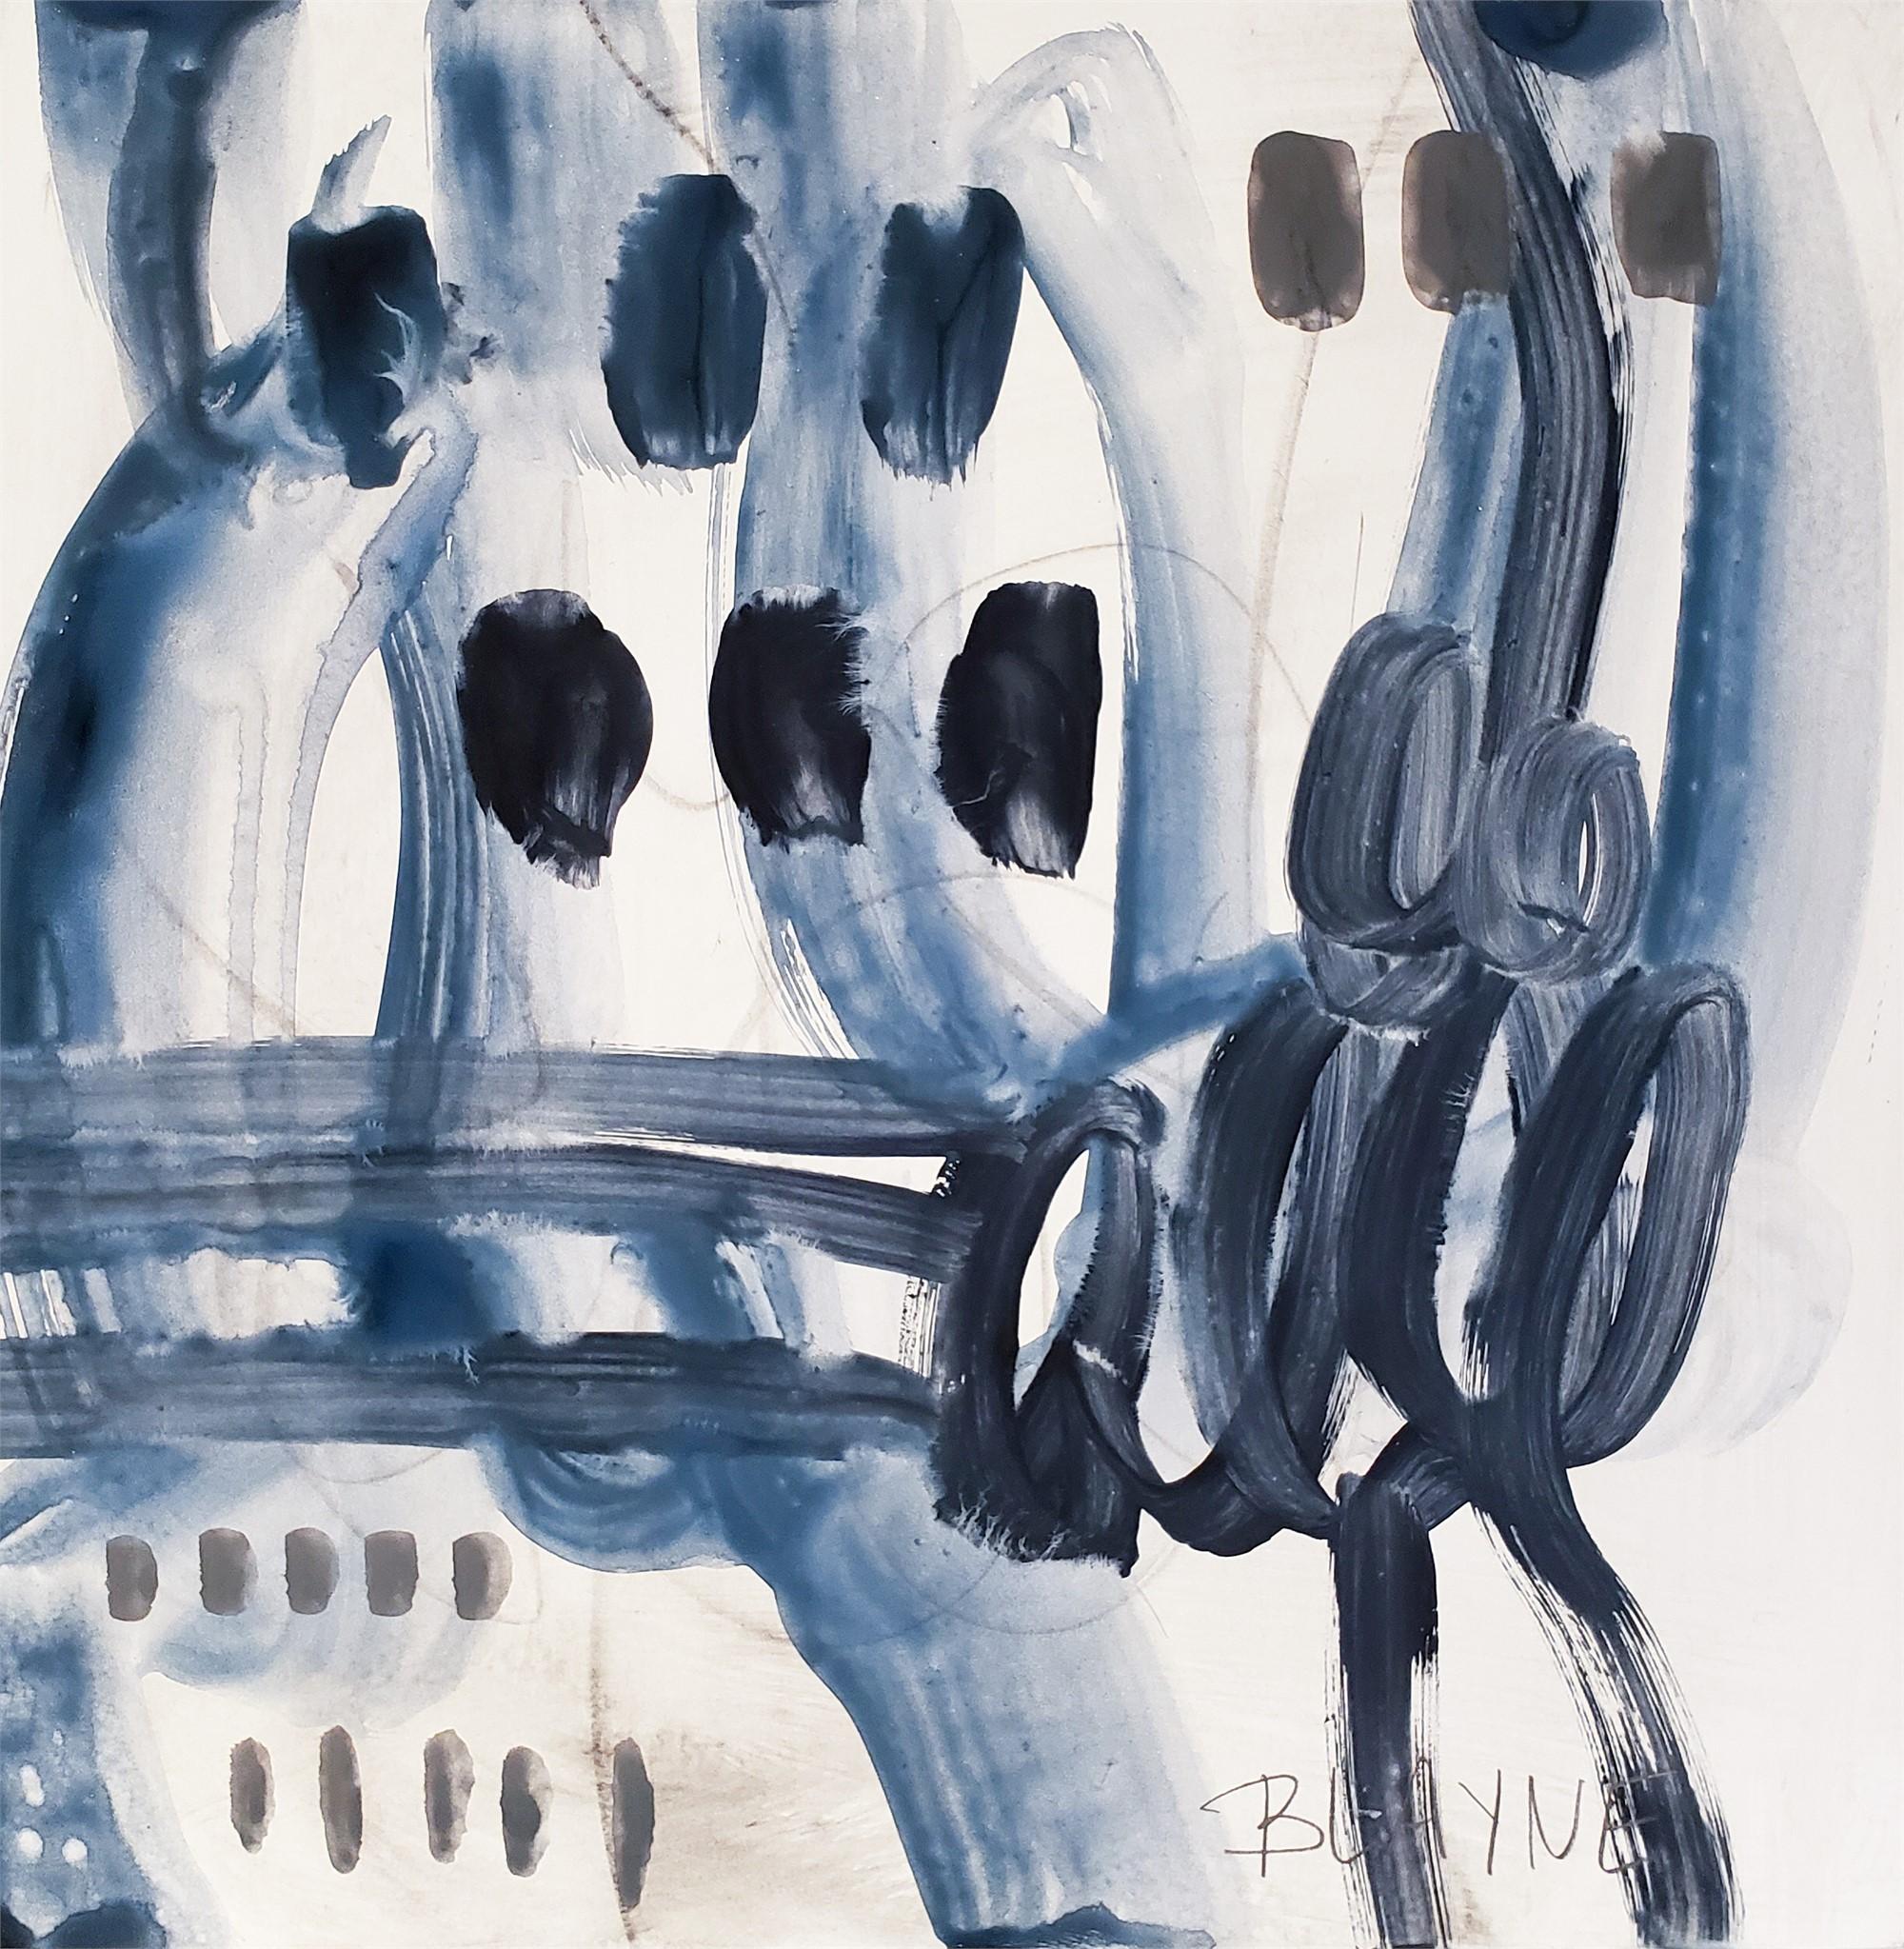 Blue Haze 1 by Blayne Macauley